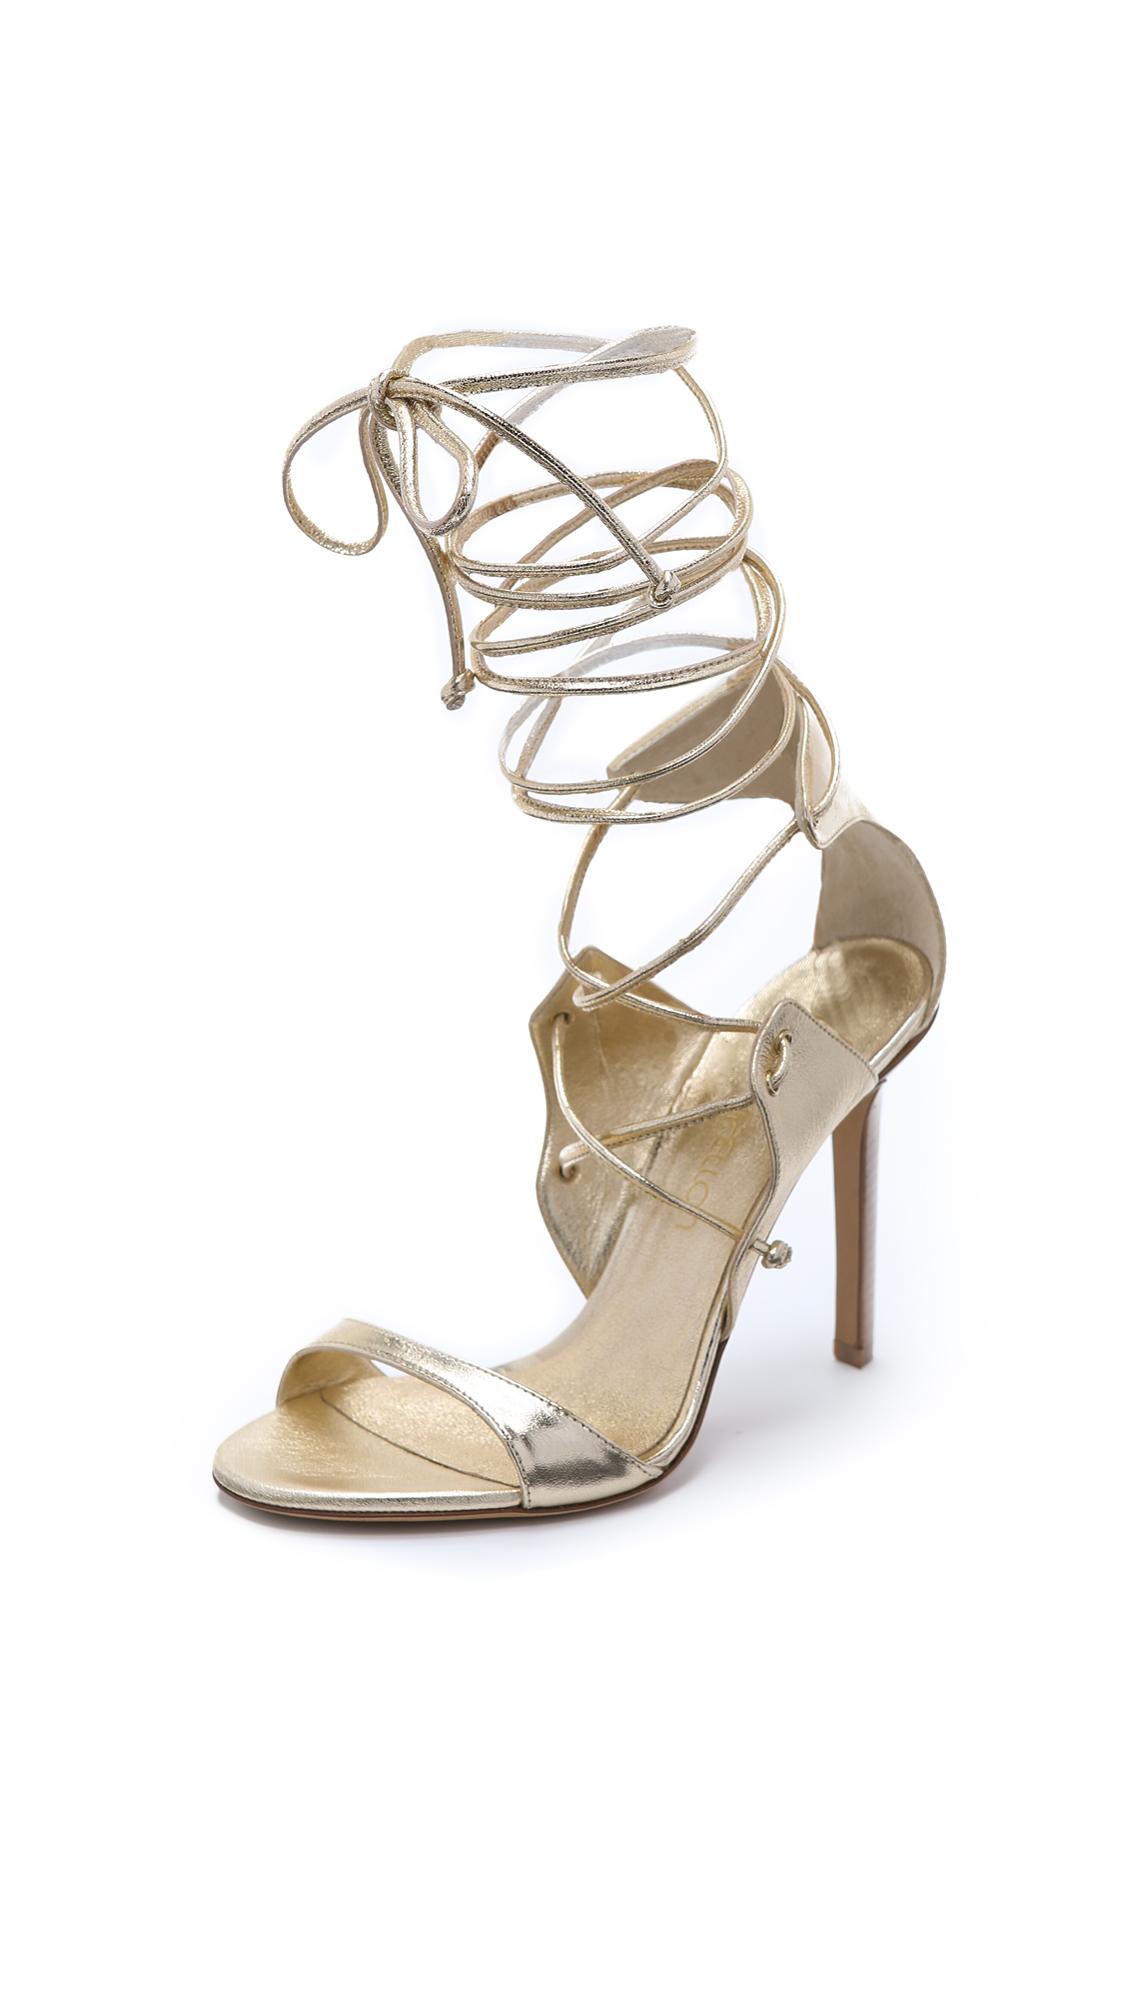 Tamara Mellon Gladiatrix Sandals In Platino